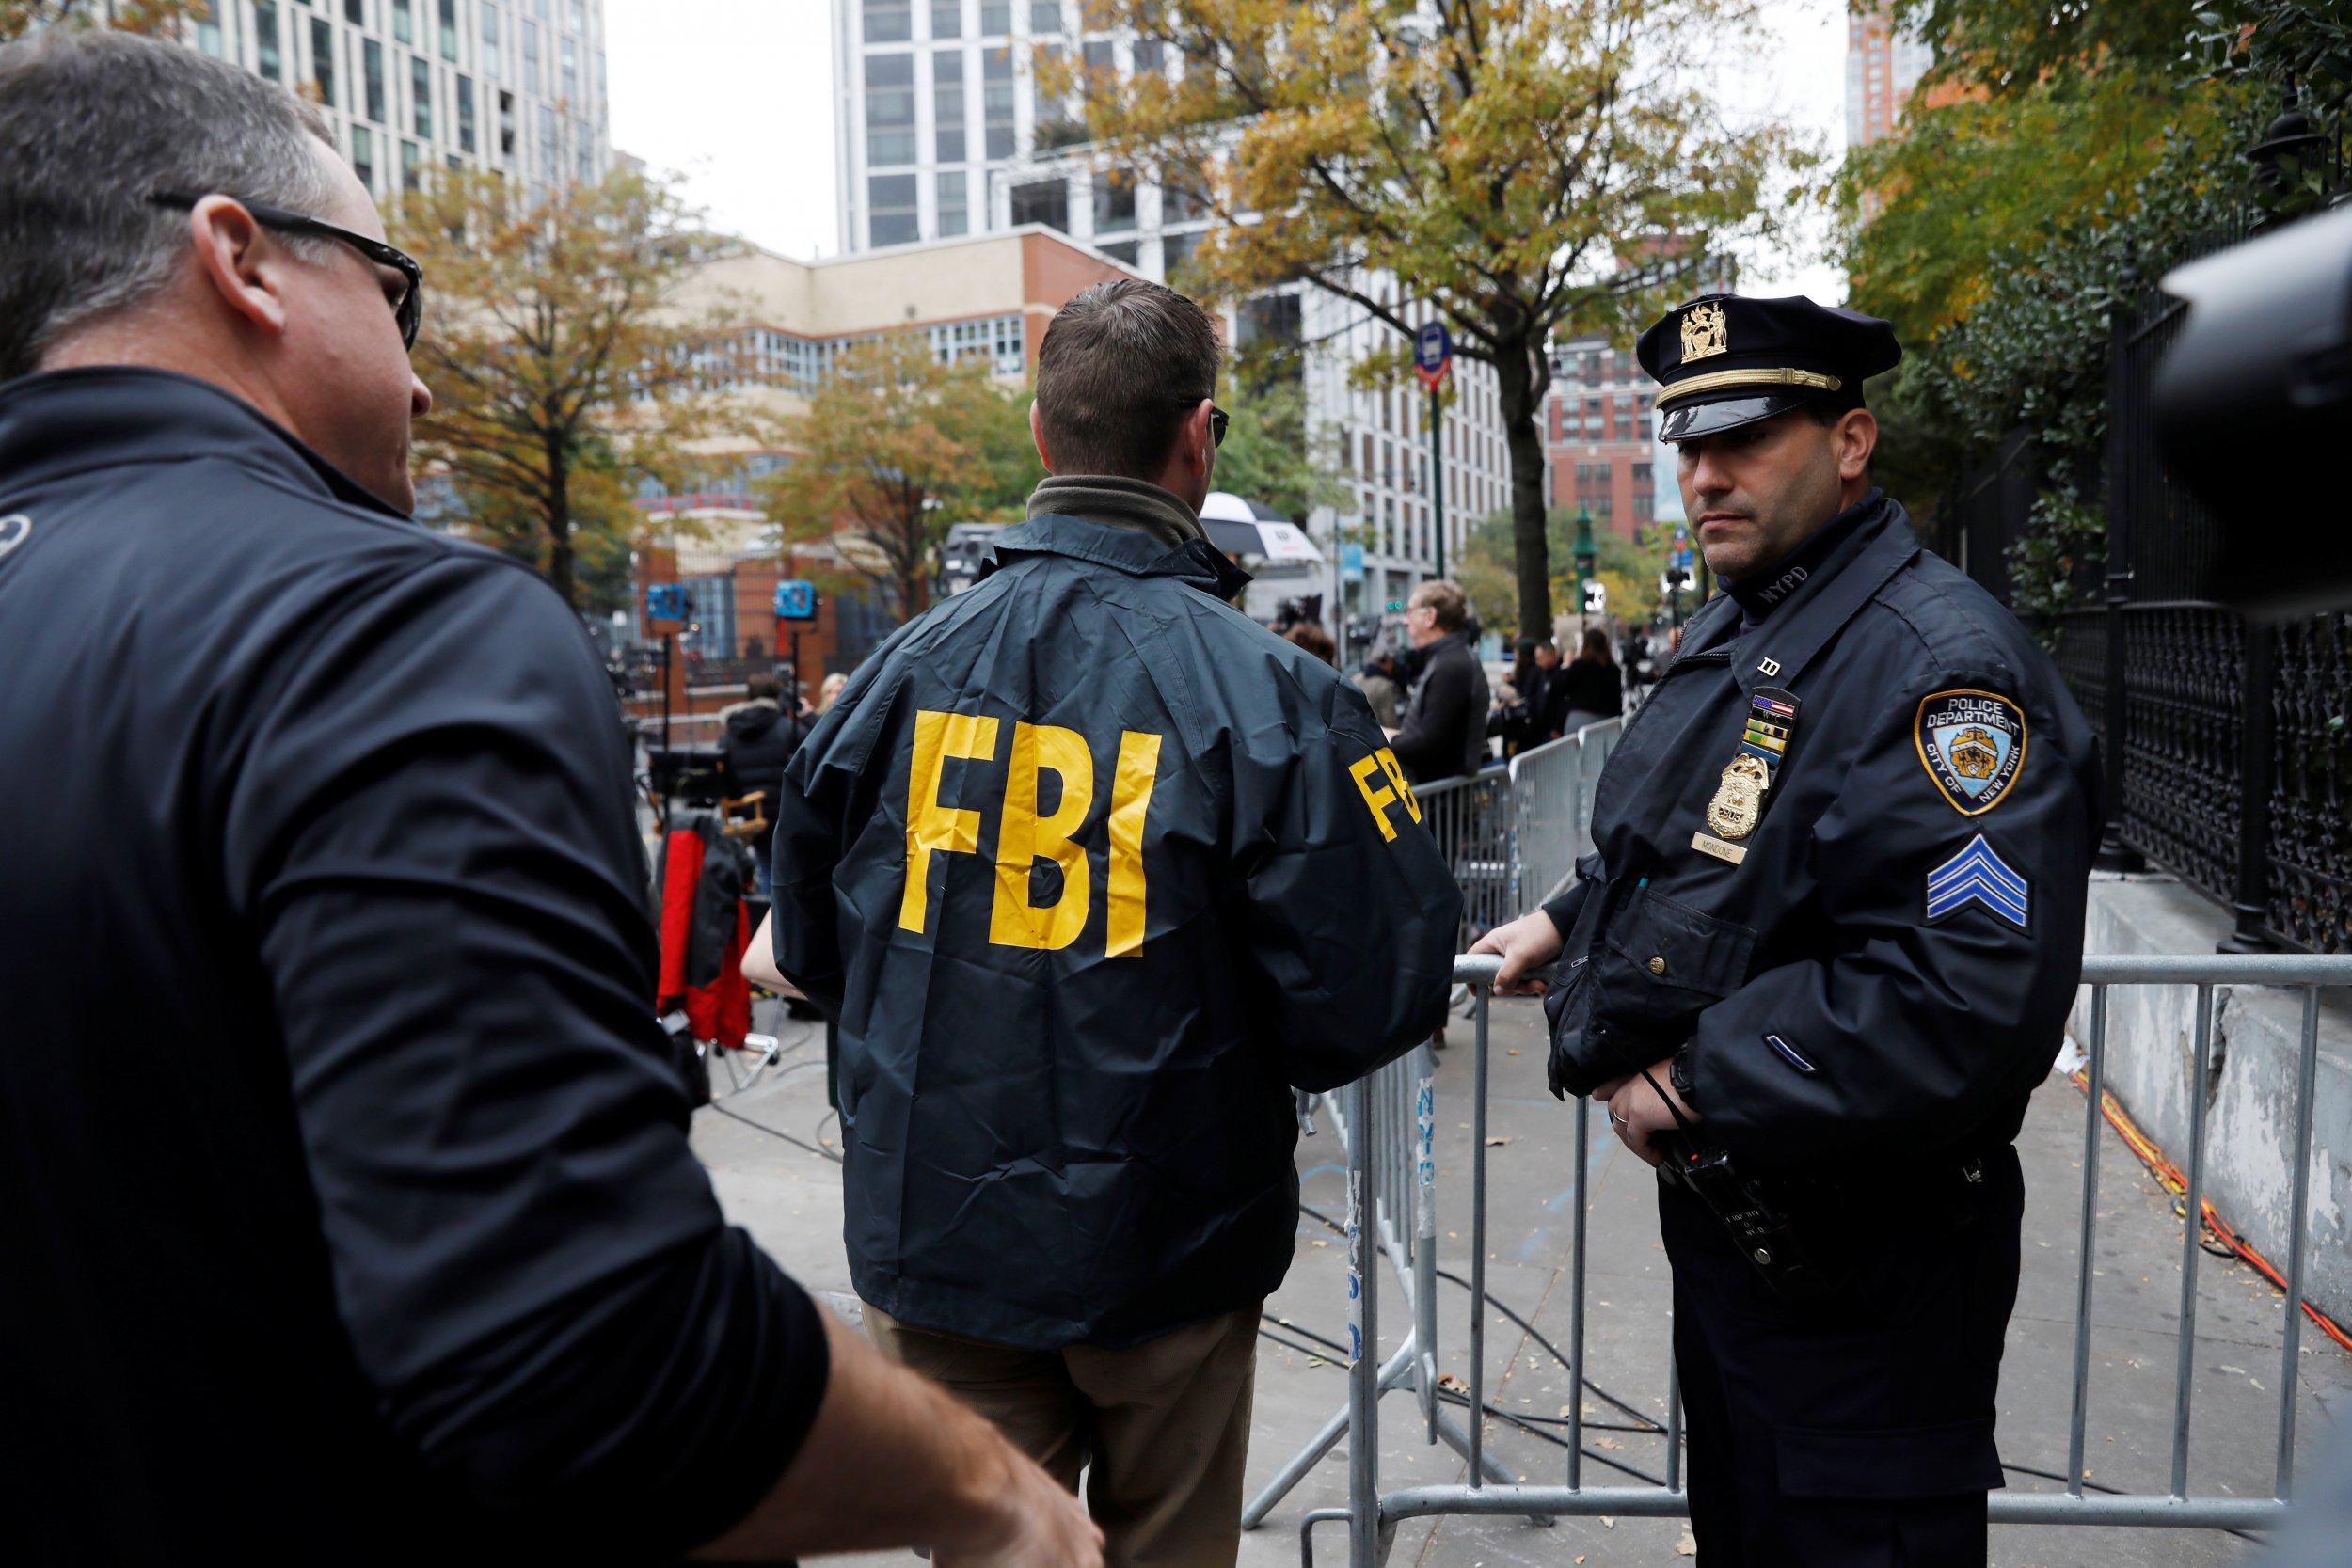 Fbi Secret Society  Rush Limbaugh  Some Republicans